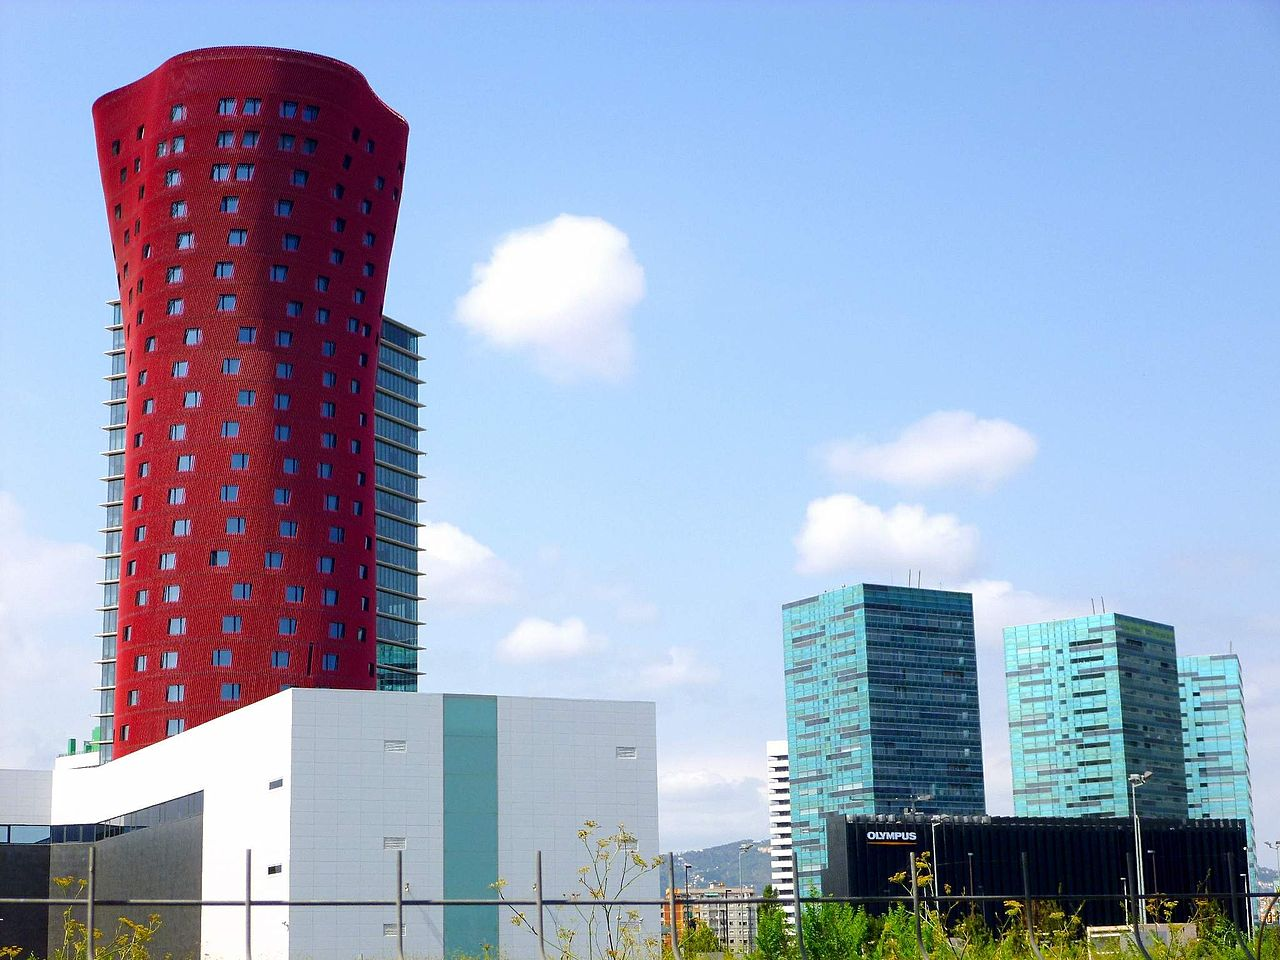 1280px-Hospitalet_de_Llobregat_-_Plaza_.JPG